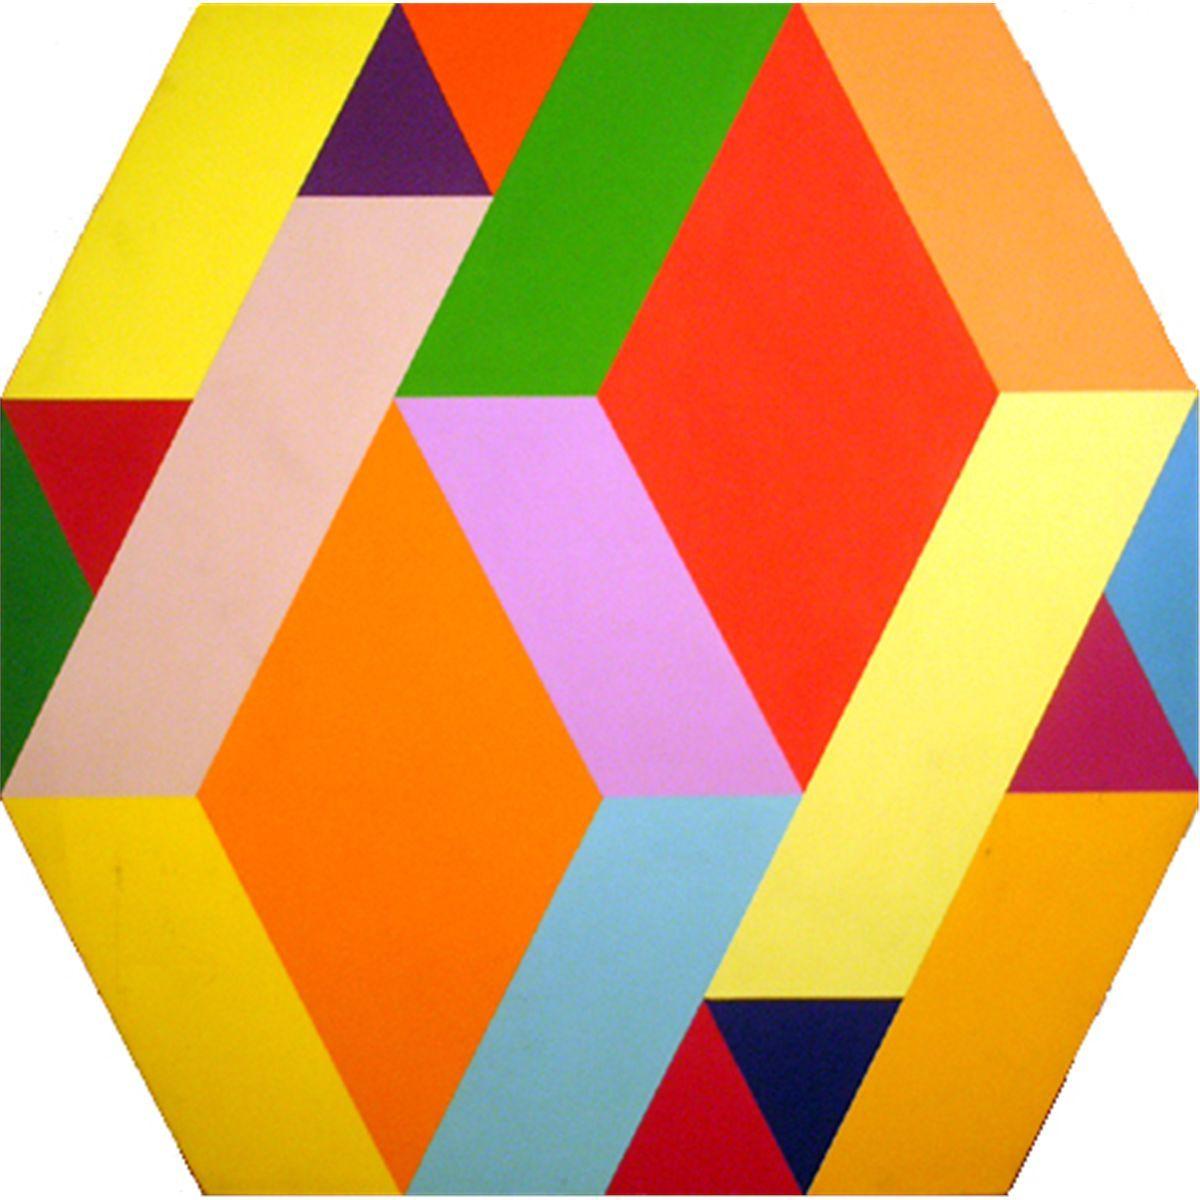 Arthur Boden - Untitled 2 .1970. Acrylic Canvas 121